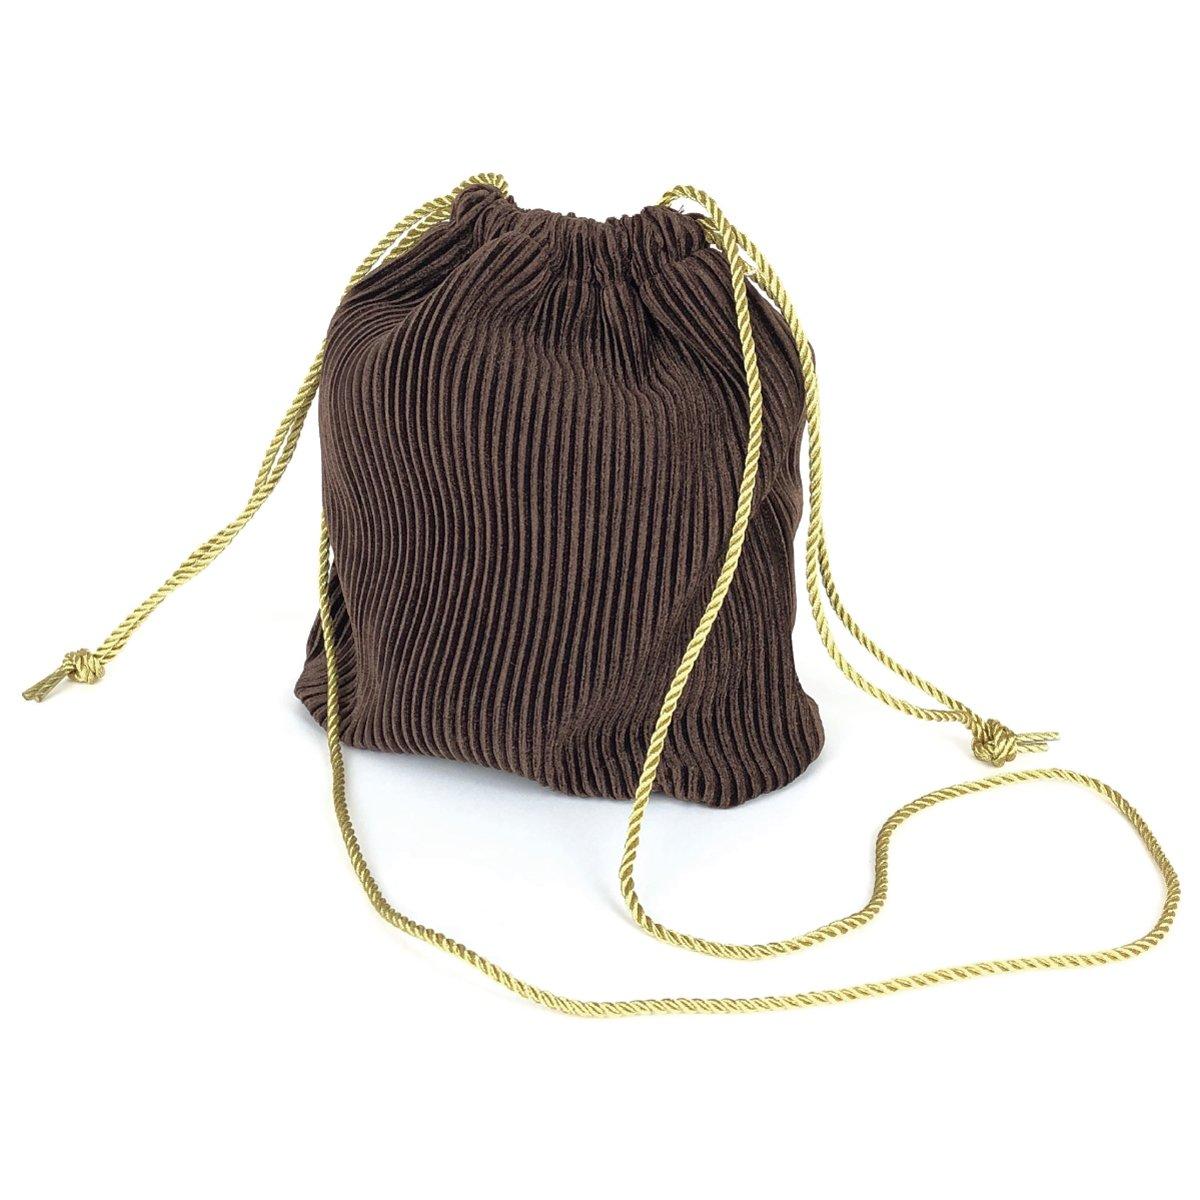 Classy Pleats Bag 詳細画像6